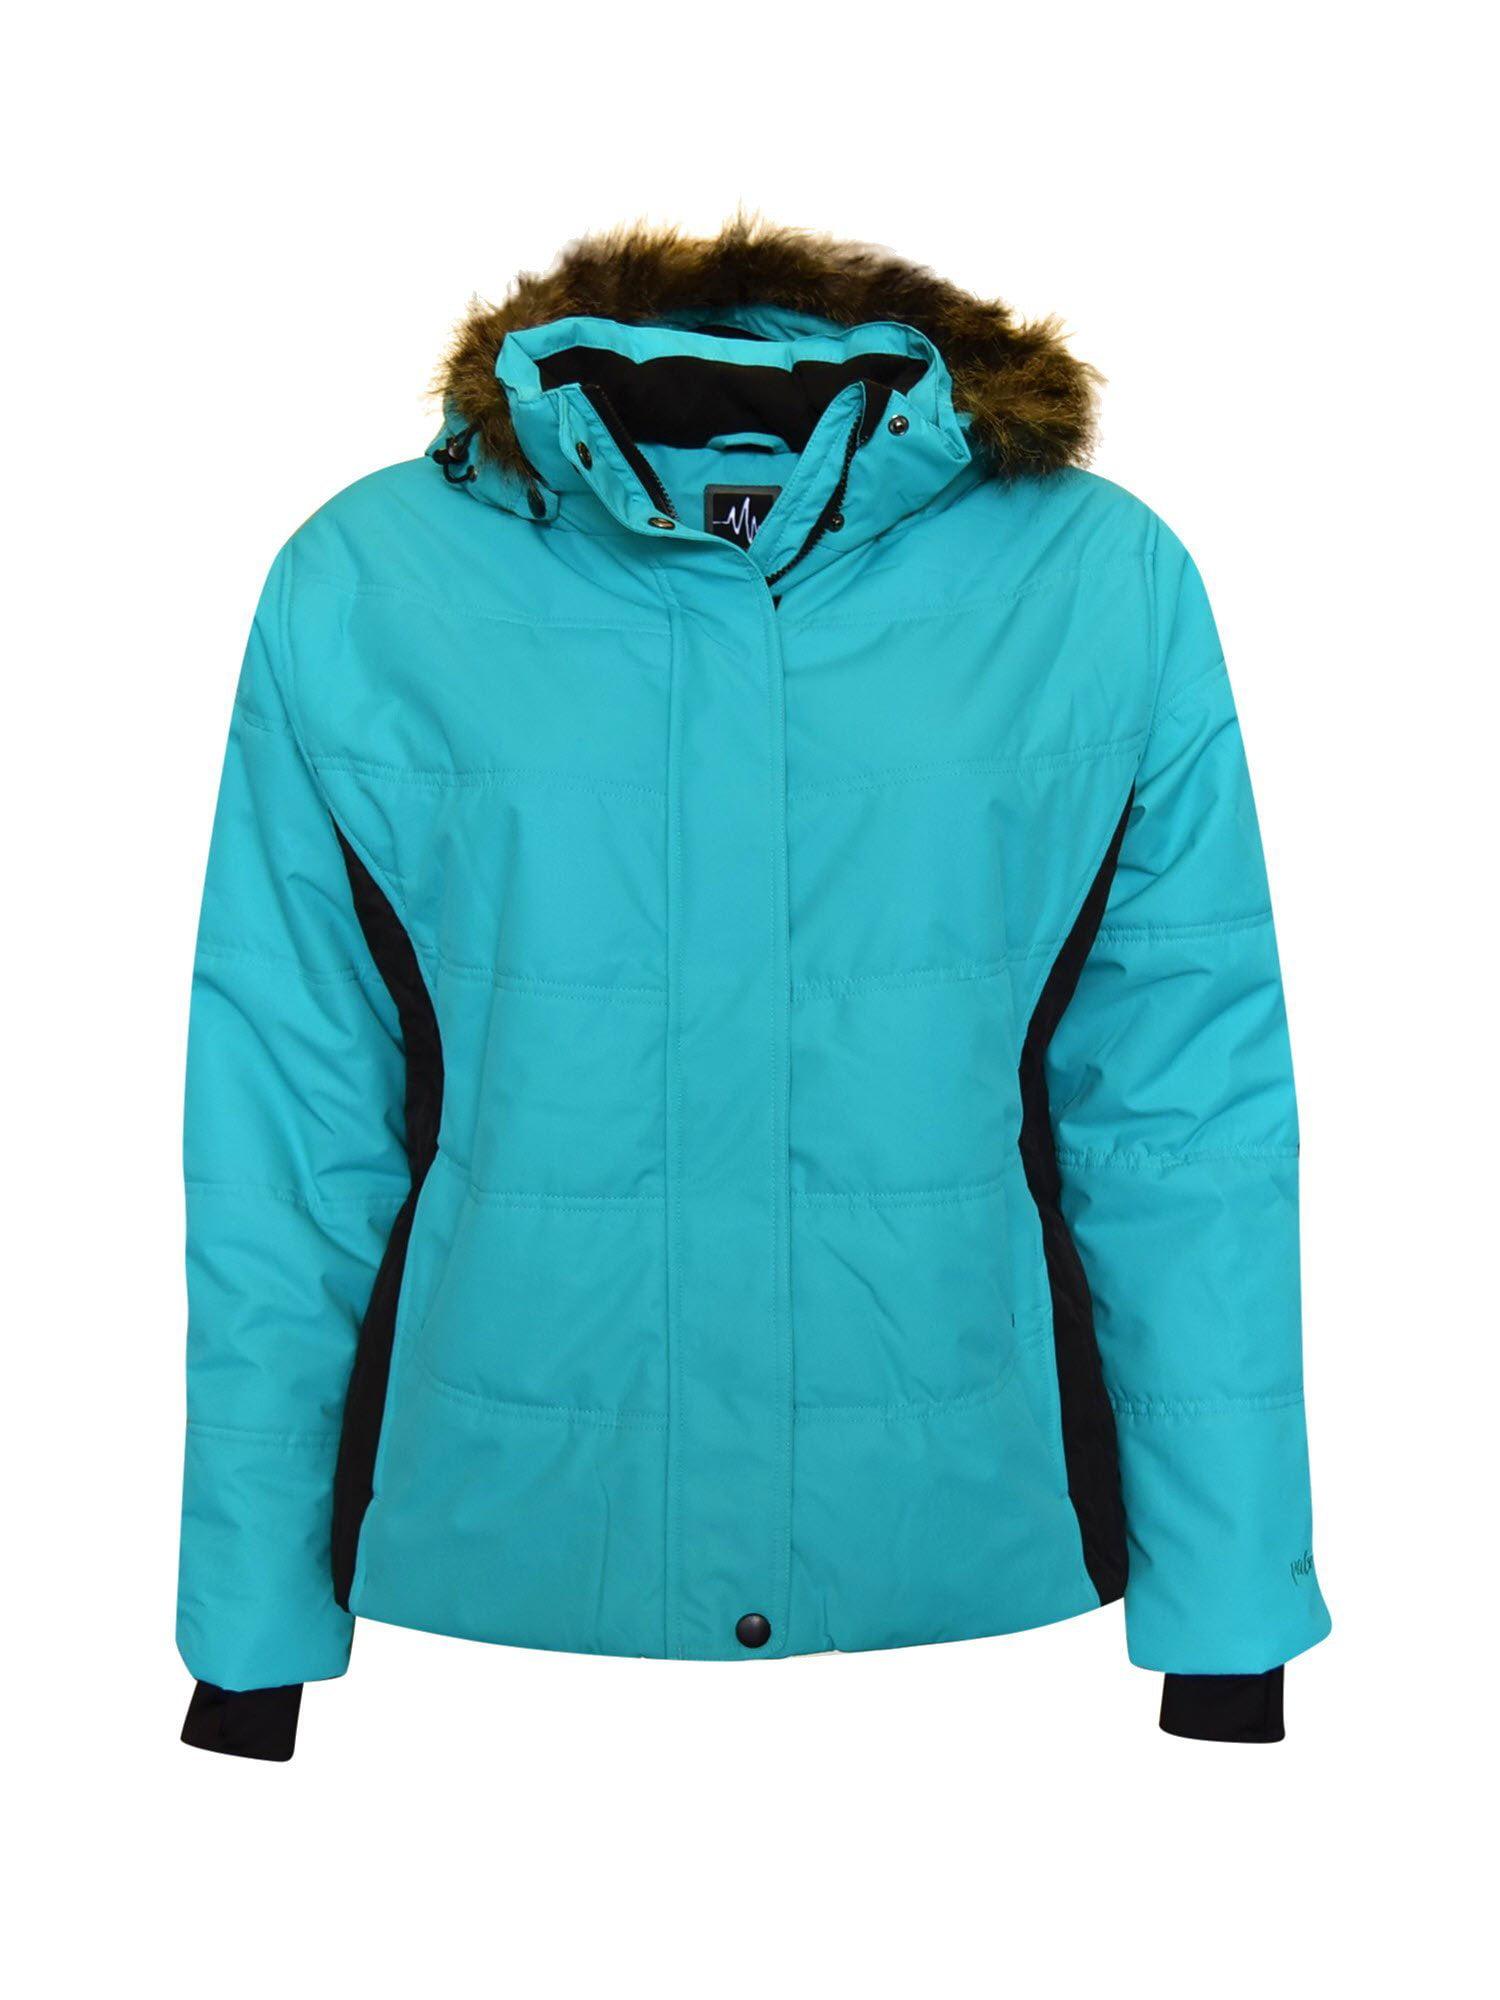 Pulse Women's Plus Extended Size Snow Ski Coat Jacket Aspens Calling 1X - 6X